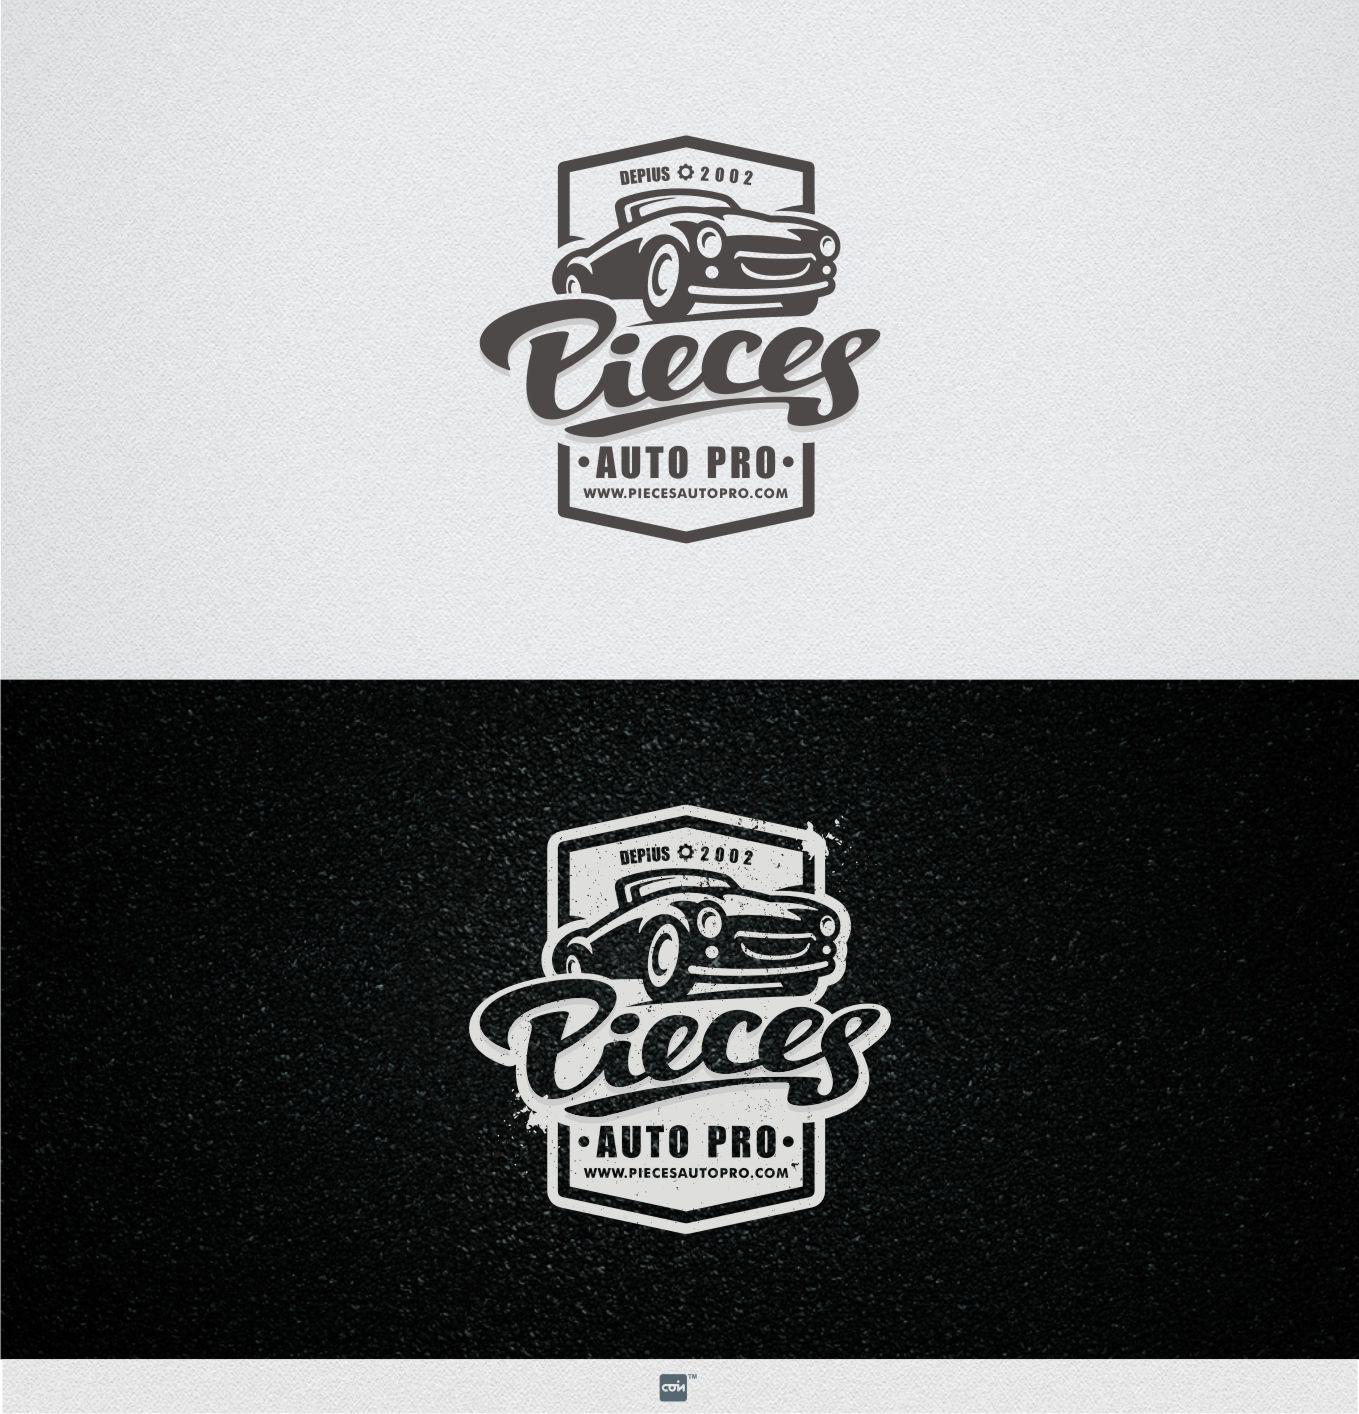 logo design by coin™ potd99 01 22 2013 cars cursive